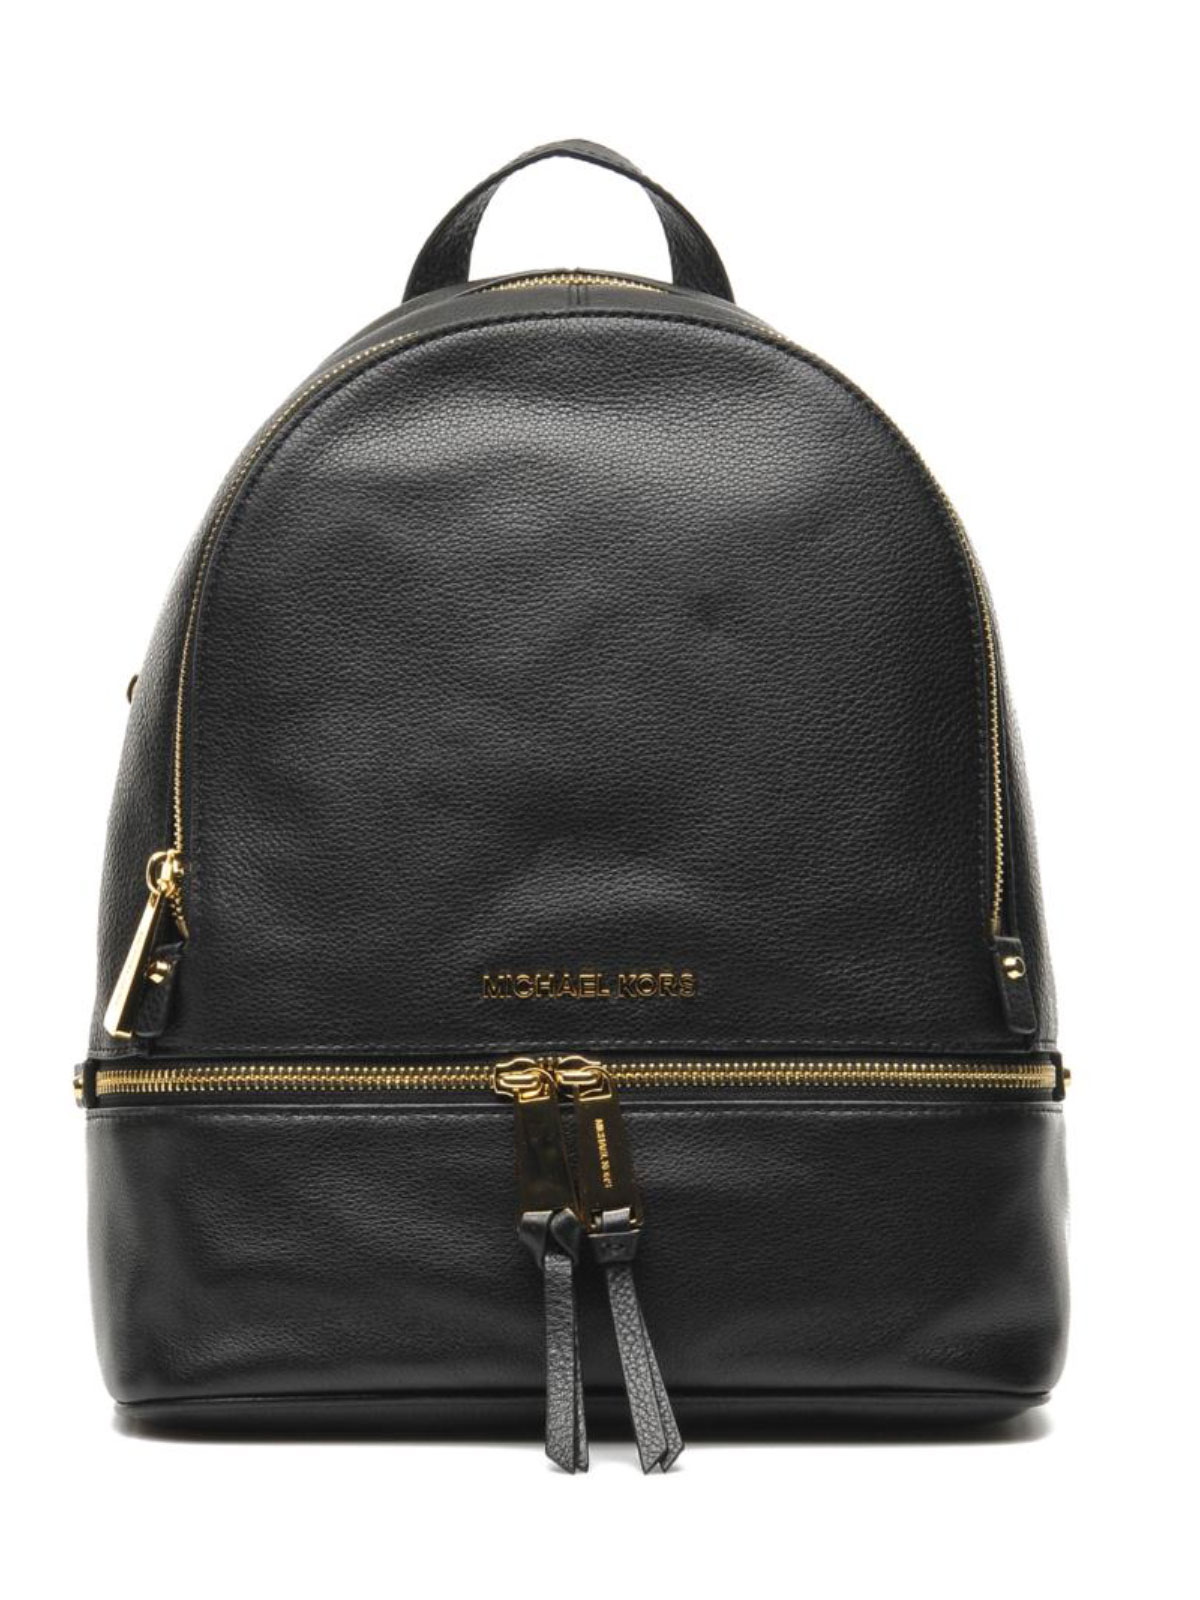 Michael Kors Rhea Medium Leather Backpack - Black - 30S5SEZB1L-001